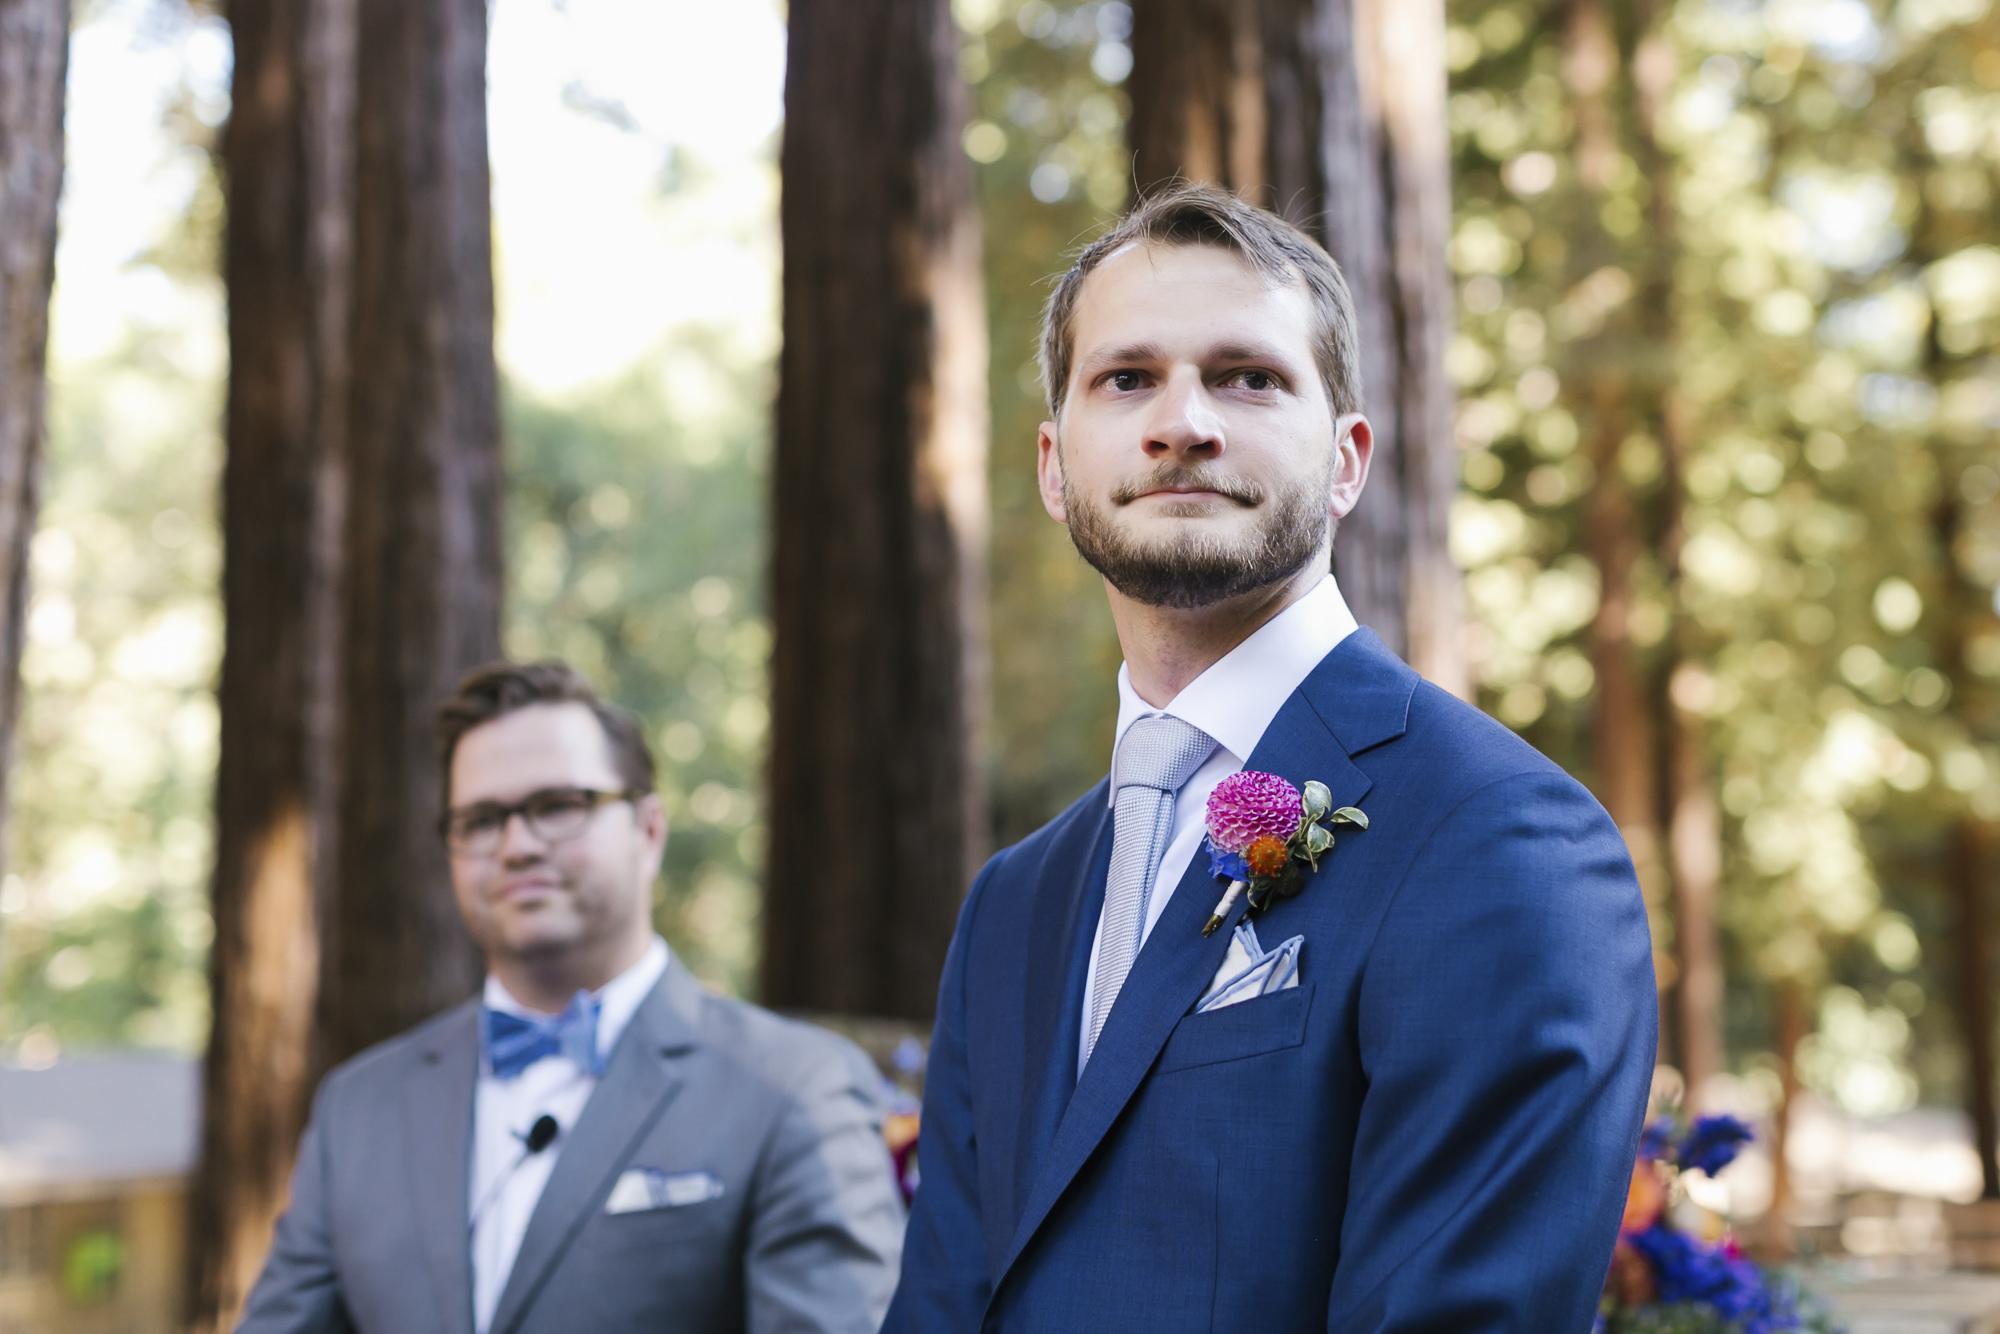 Groom in blue suit awaits his bride in the redwoods